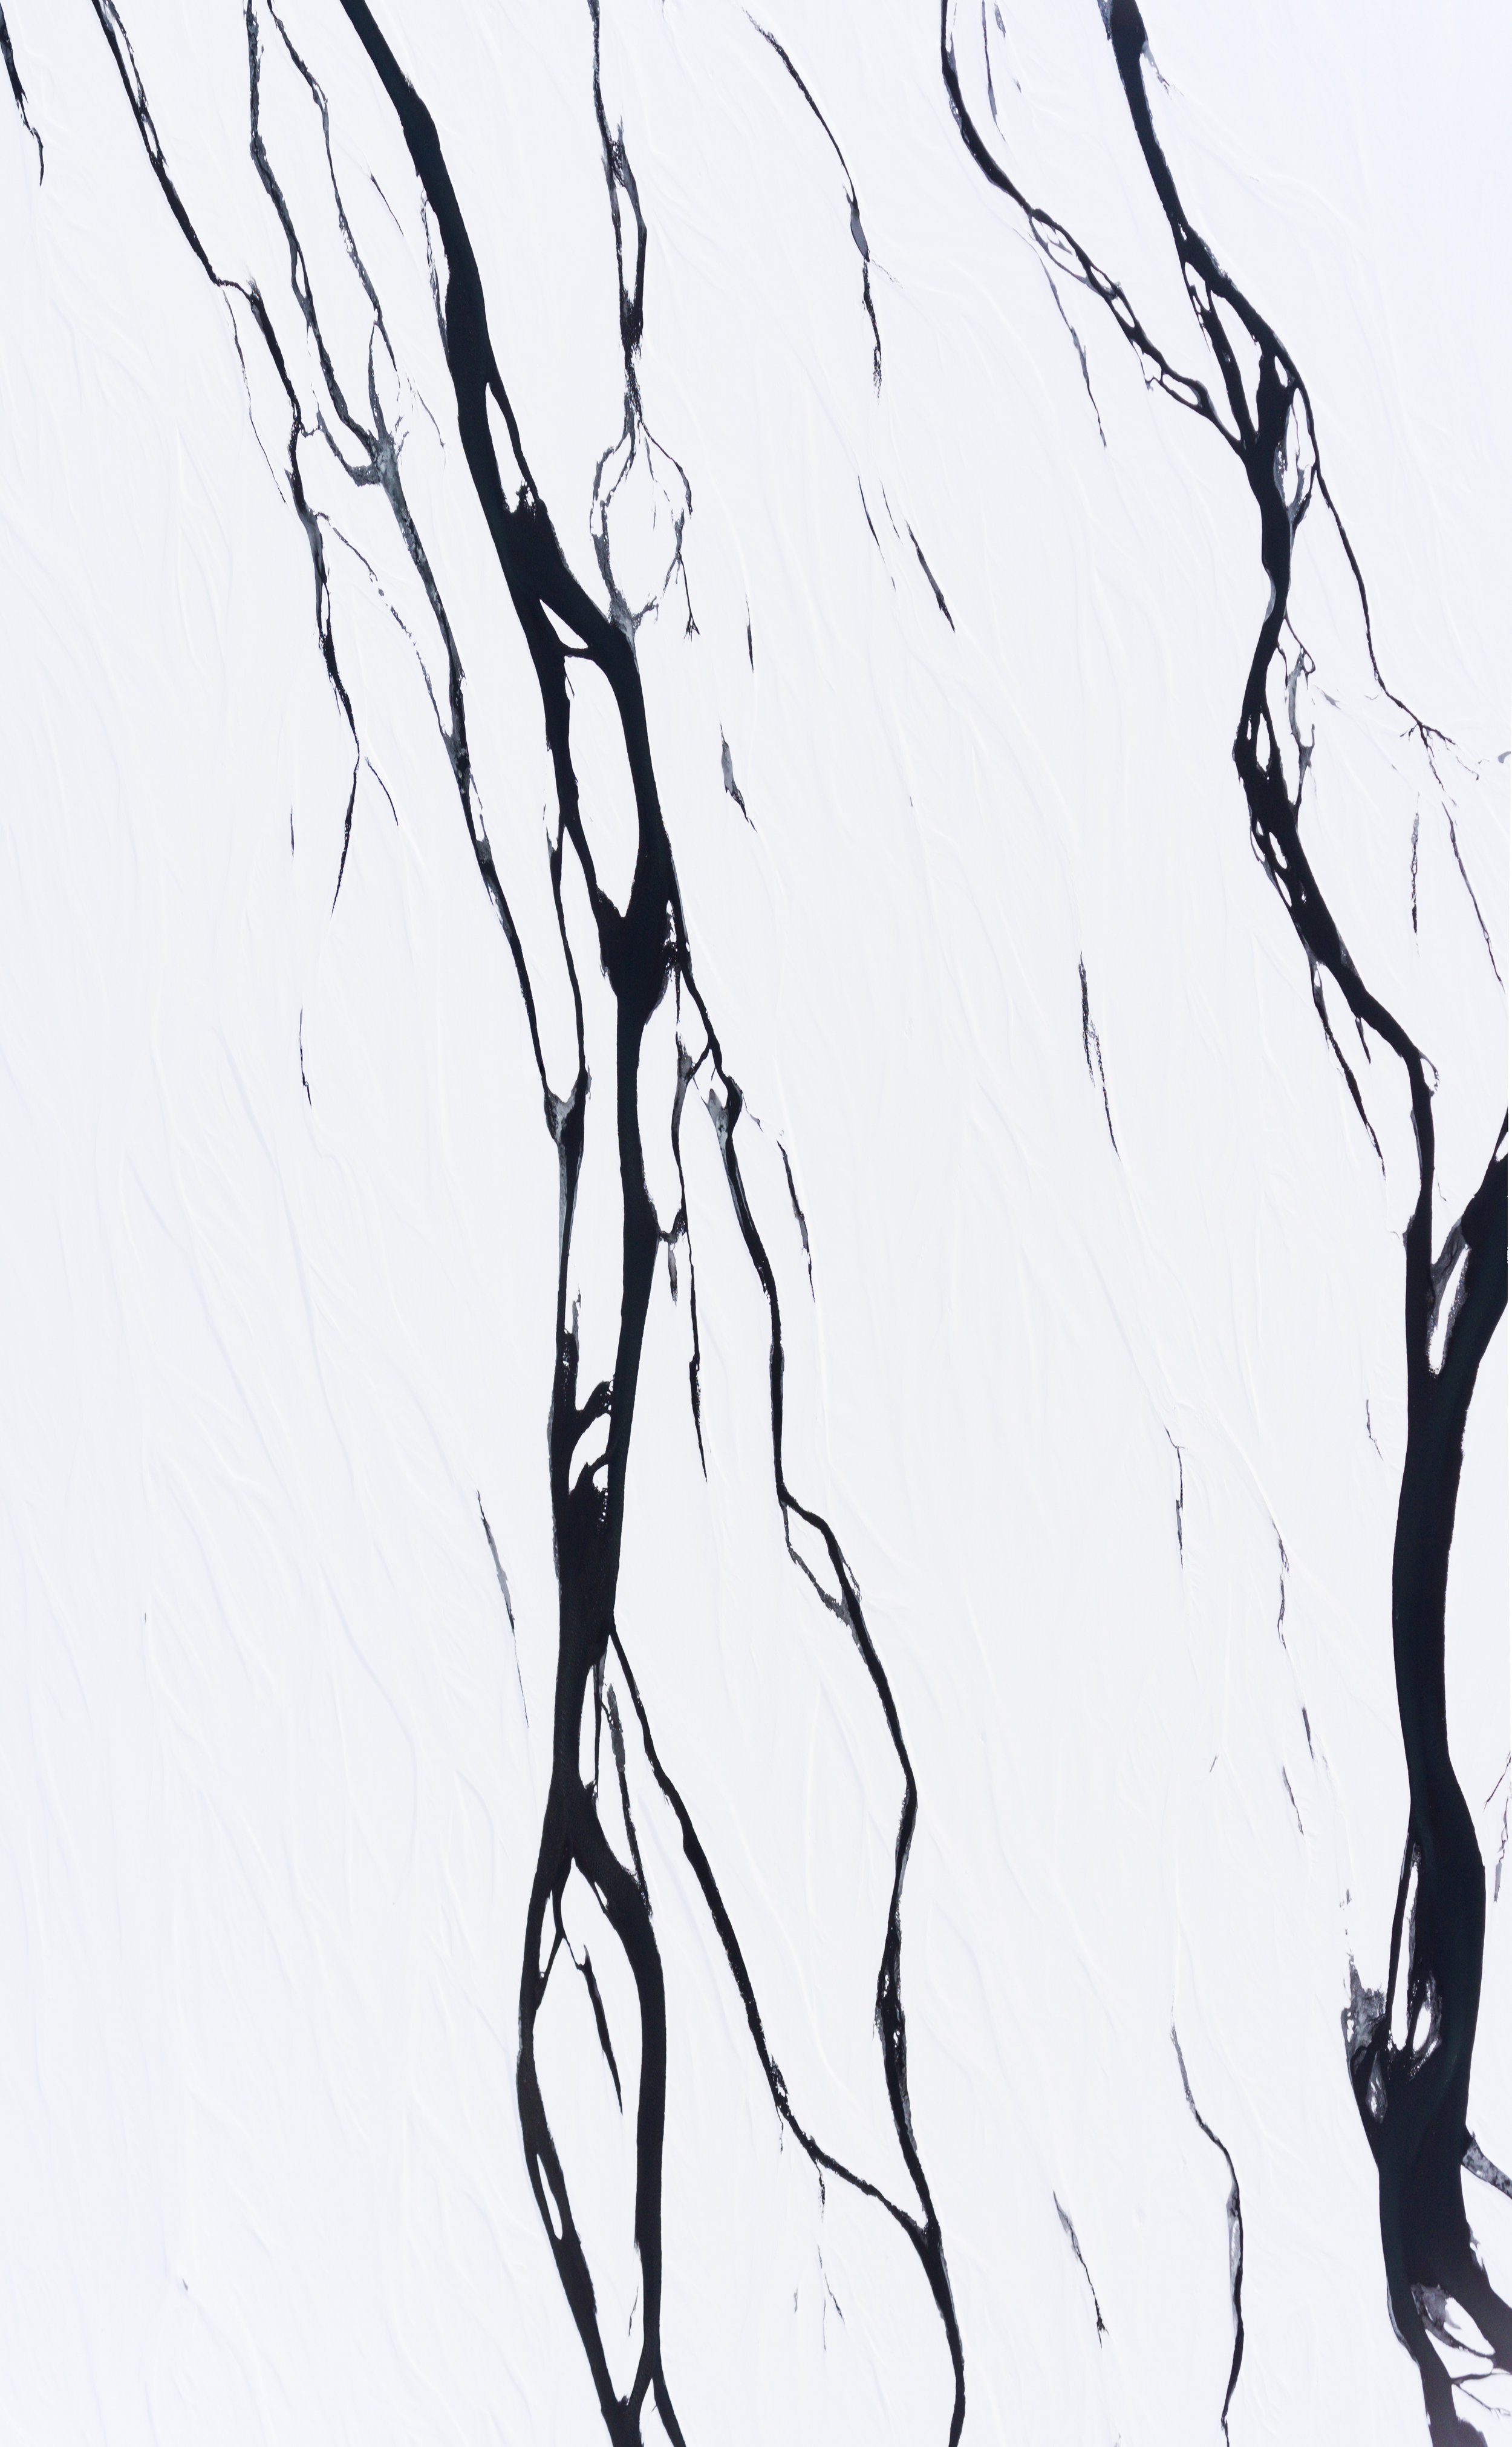 jermiah-schuster-iceland-380.jpg